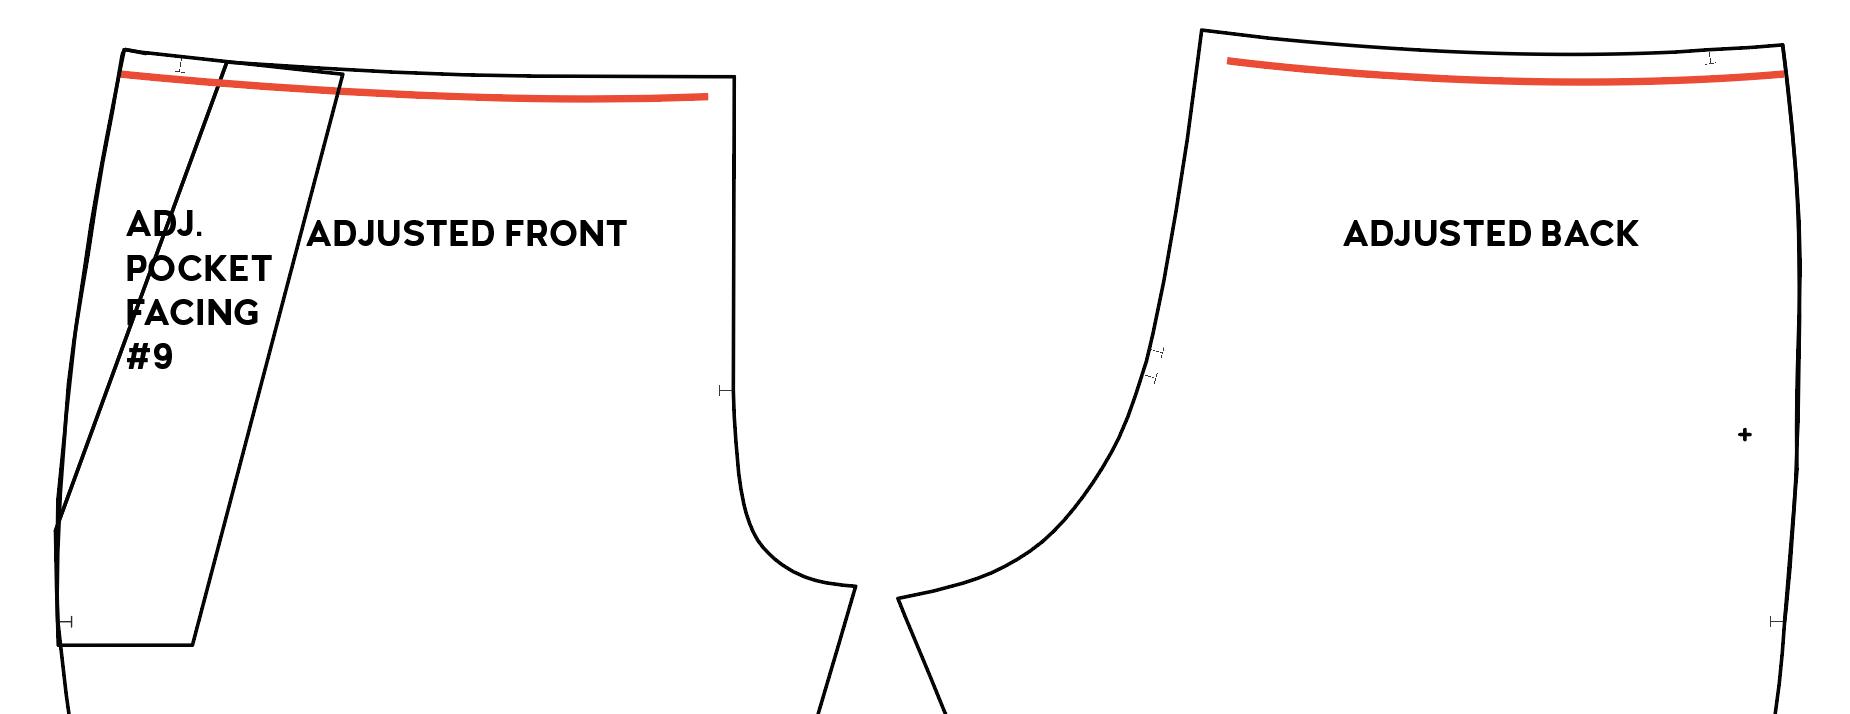 Crew tutorial illustrations are shown